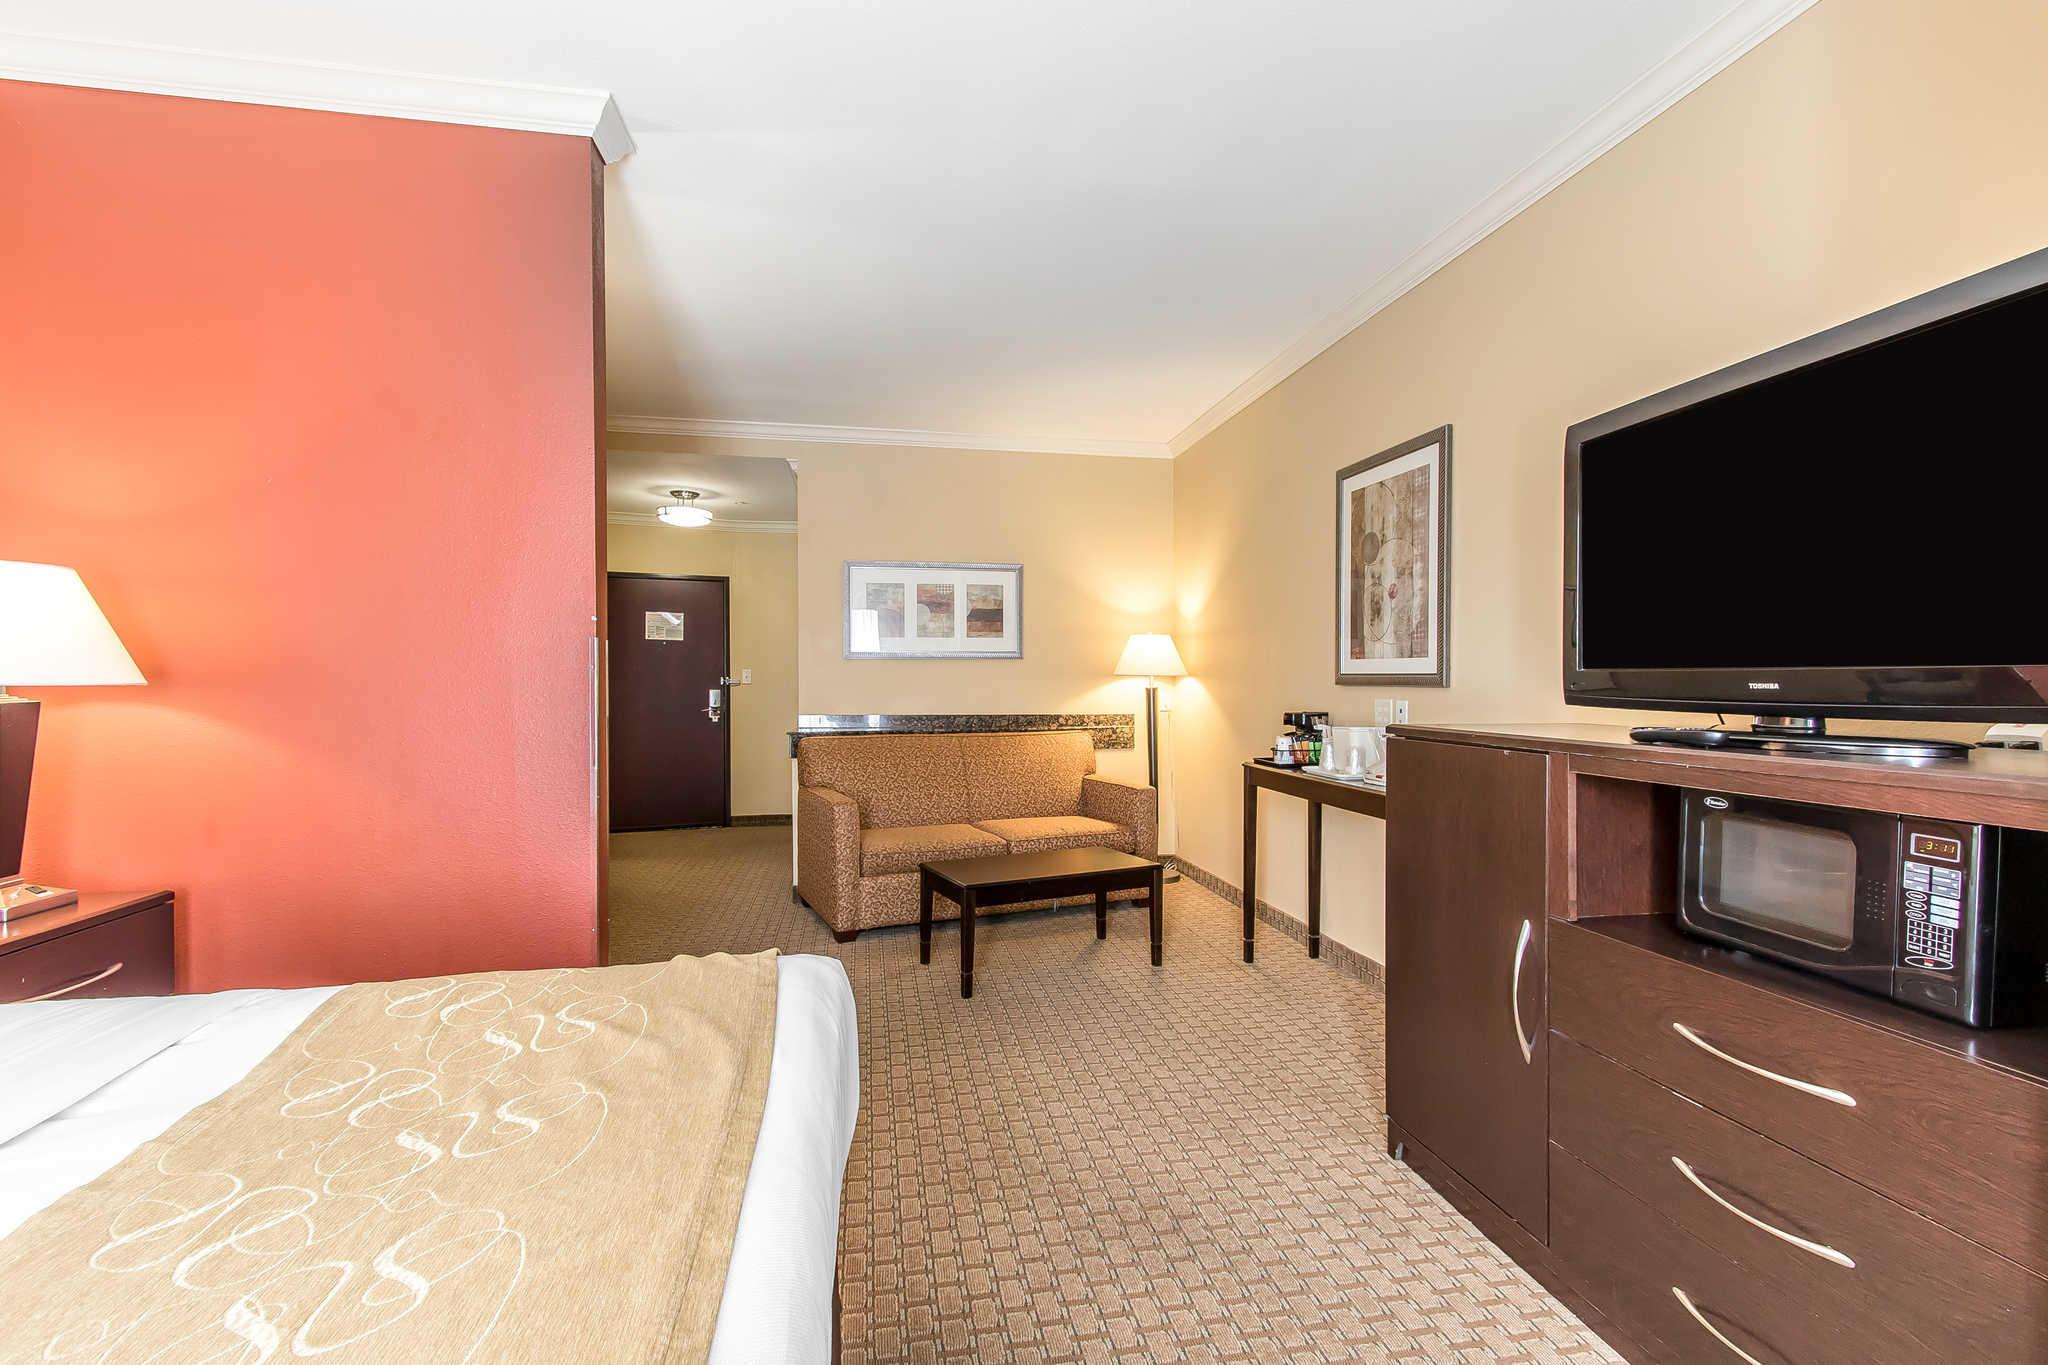 Comfort Suites image 12